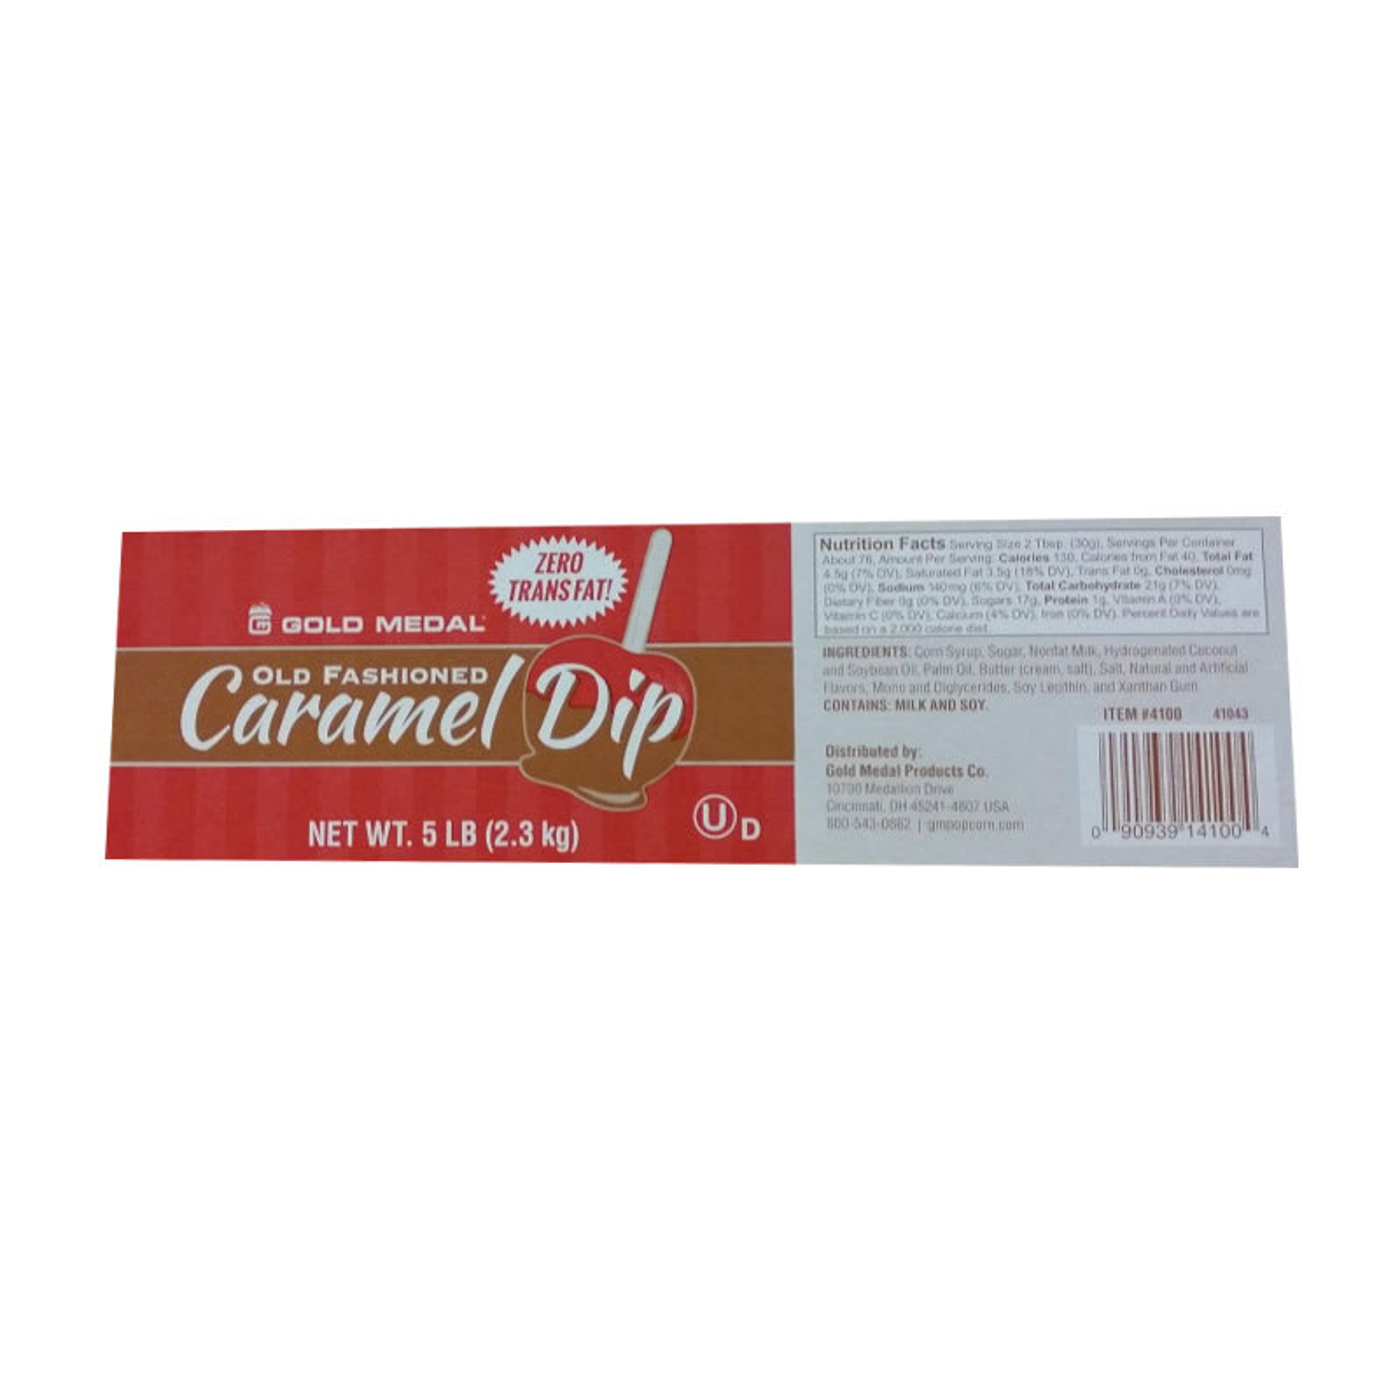 Gold Medal 4100 5 lb 0g Trans Fat Old Fashioned Caramel Apple Dip